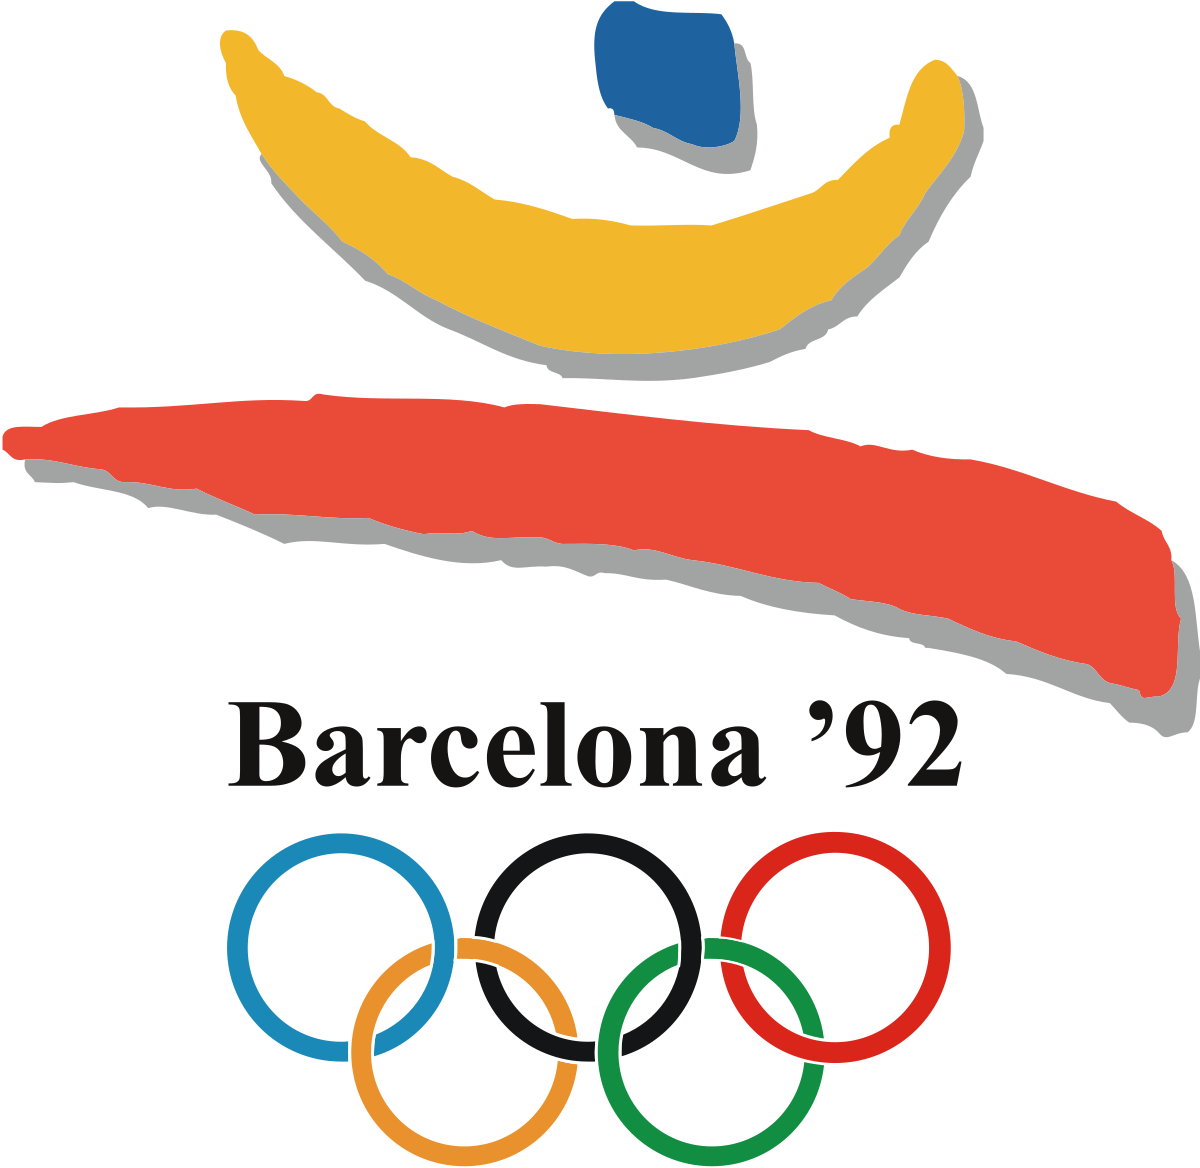 1992 Barcelone